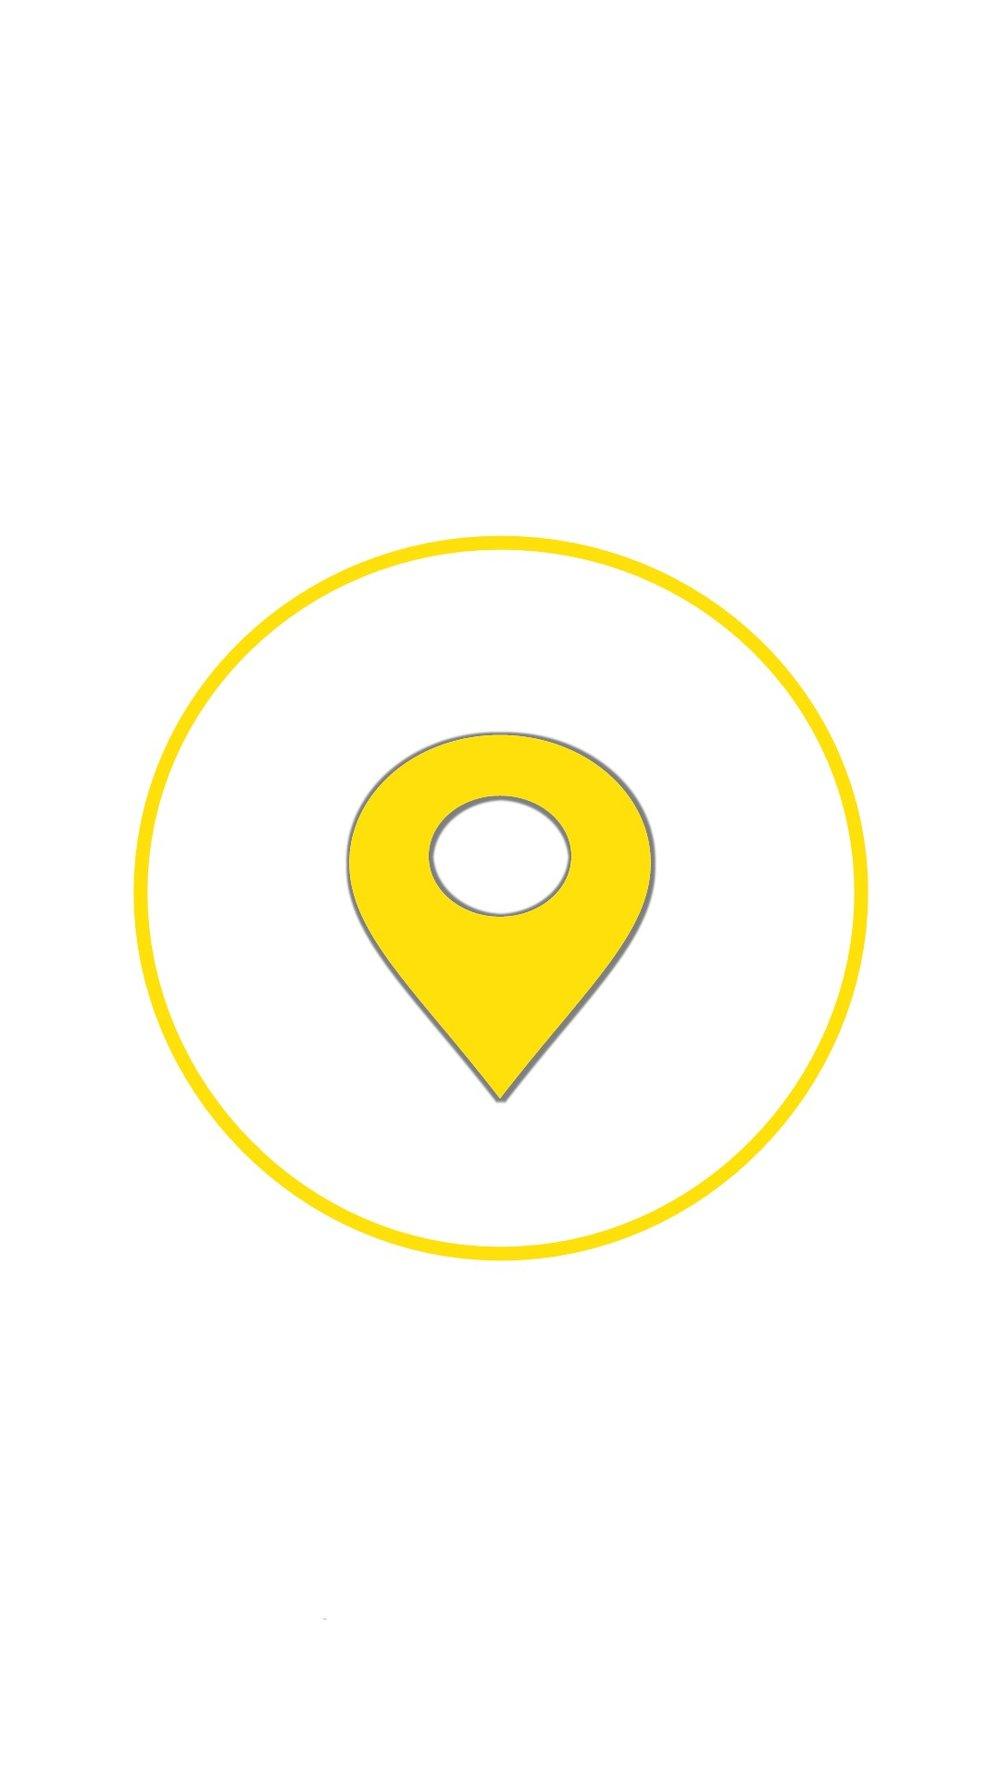 Instagram-cover-location-yellow-lotnotes.com.jpg